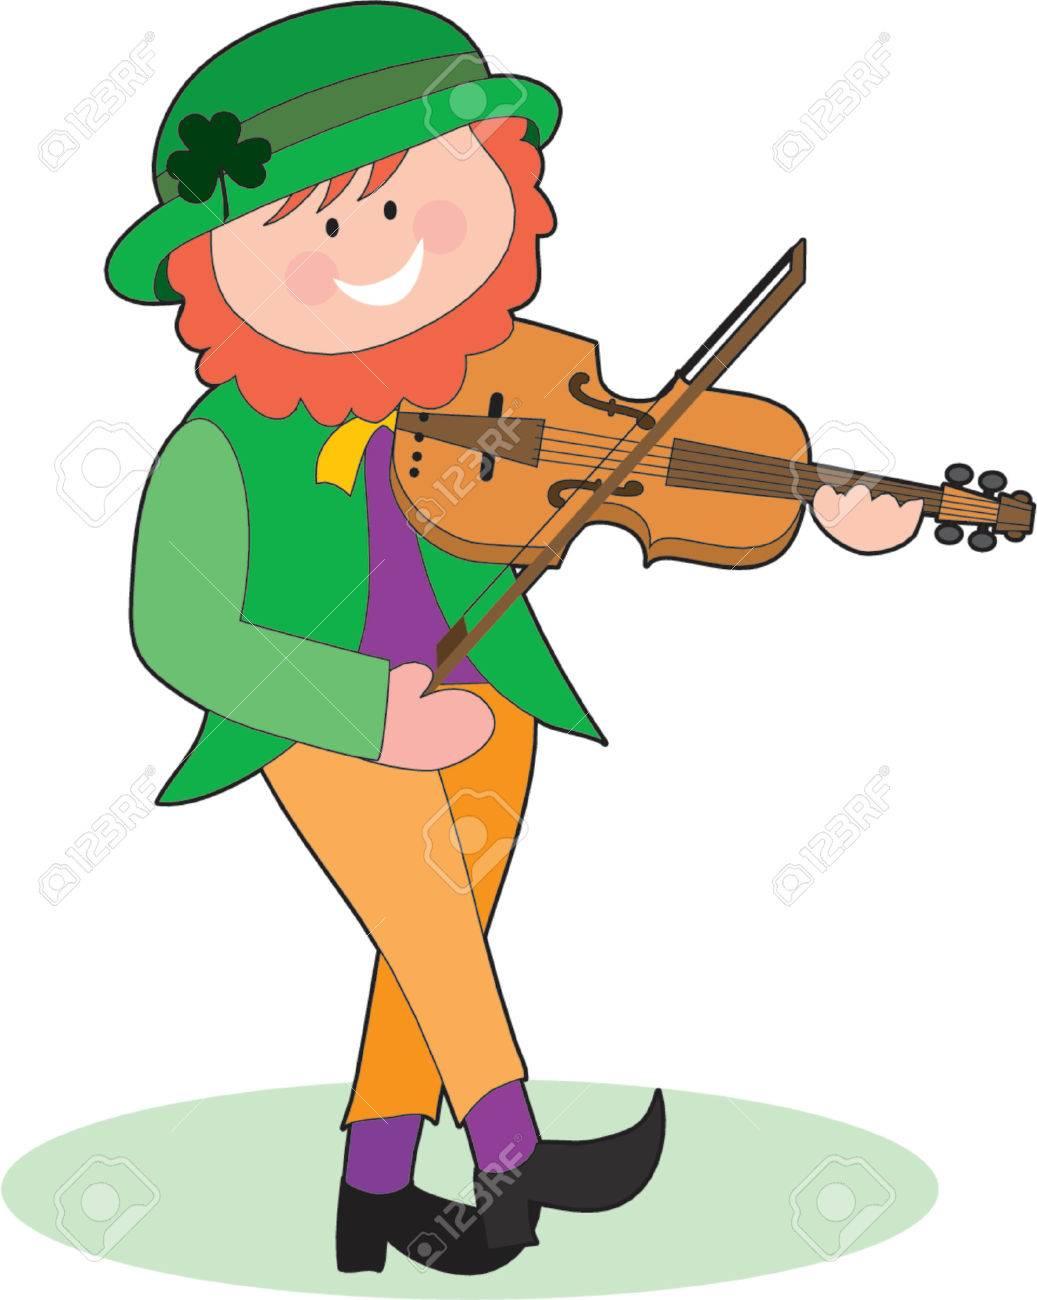 An Irish Leprechaun playing a violin and dancing Stock Vector - 755643